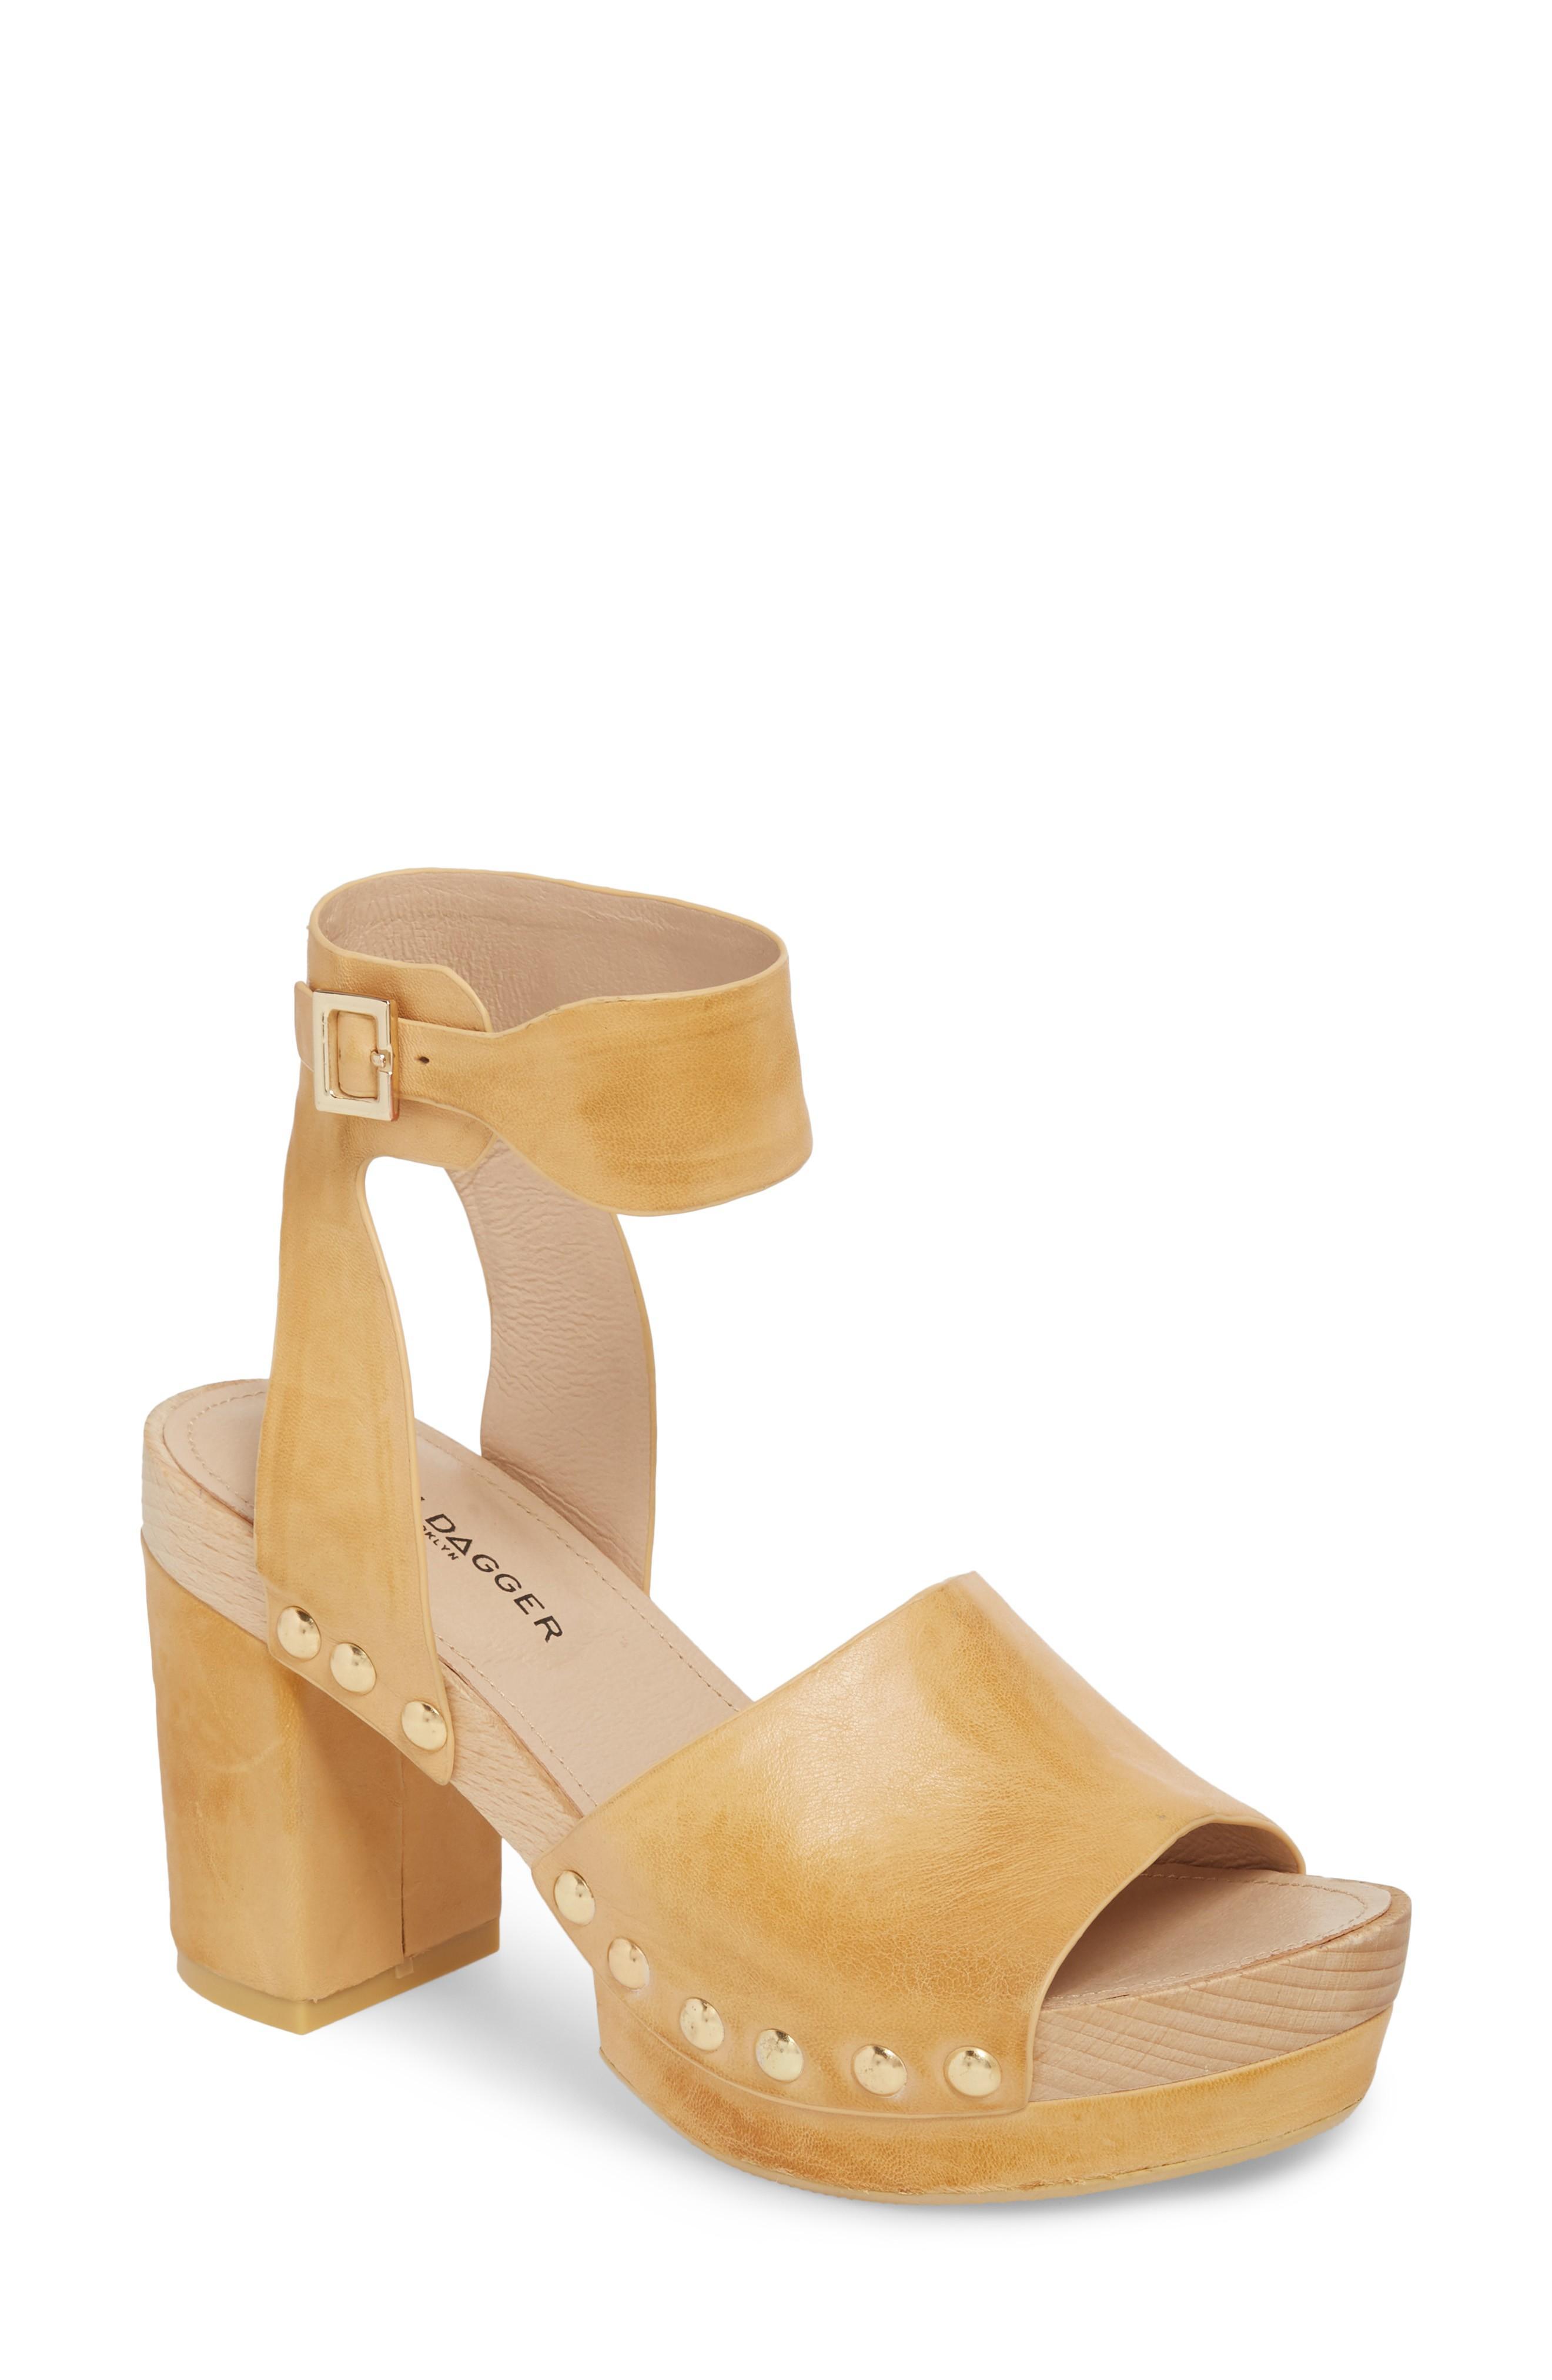 66ca094d421 Kelsi Dagger Brooklyn Farris Platform Sandal In Marigold Leather ...